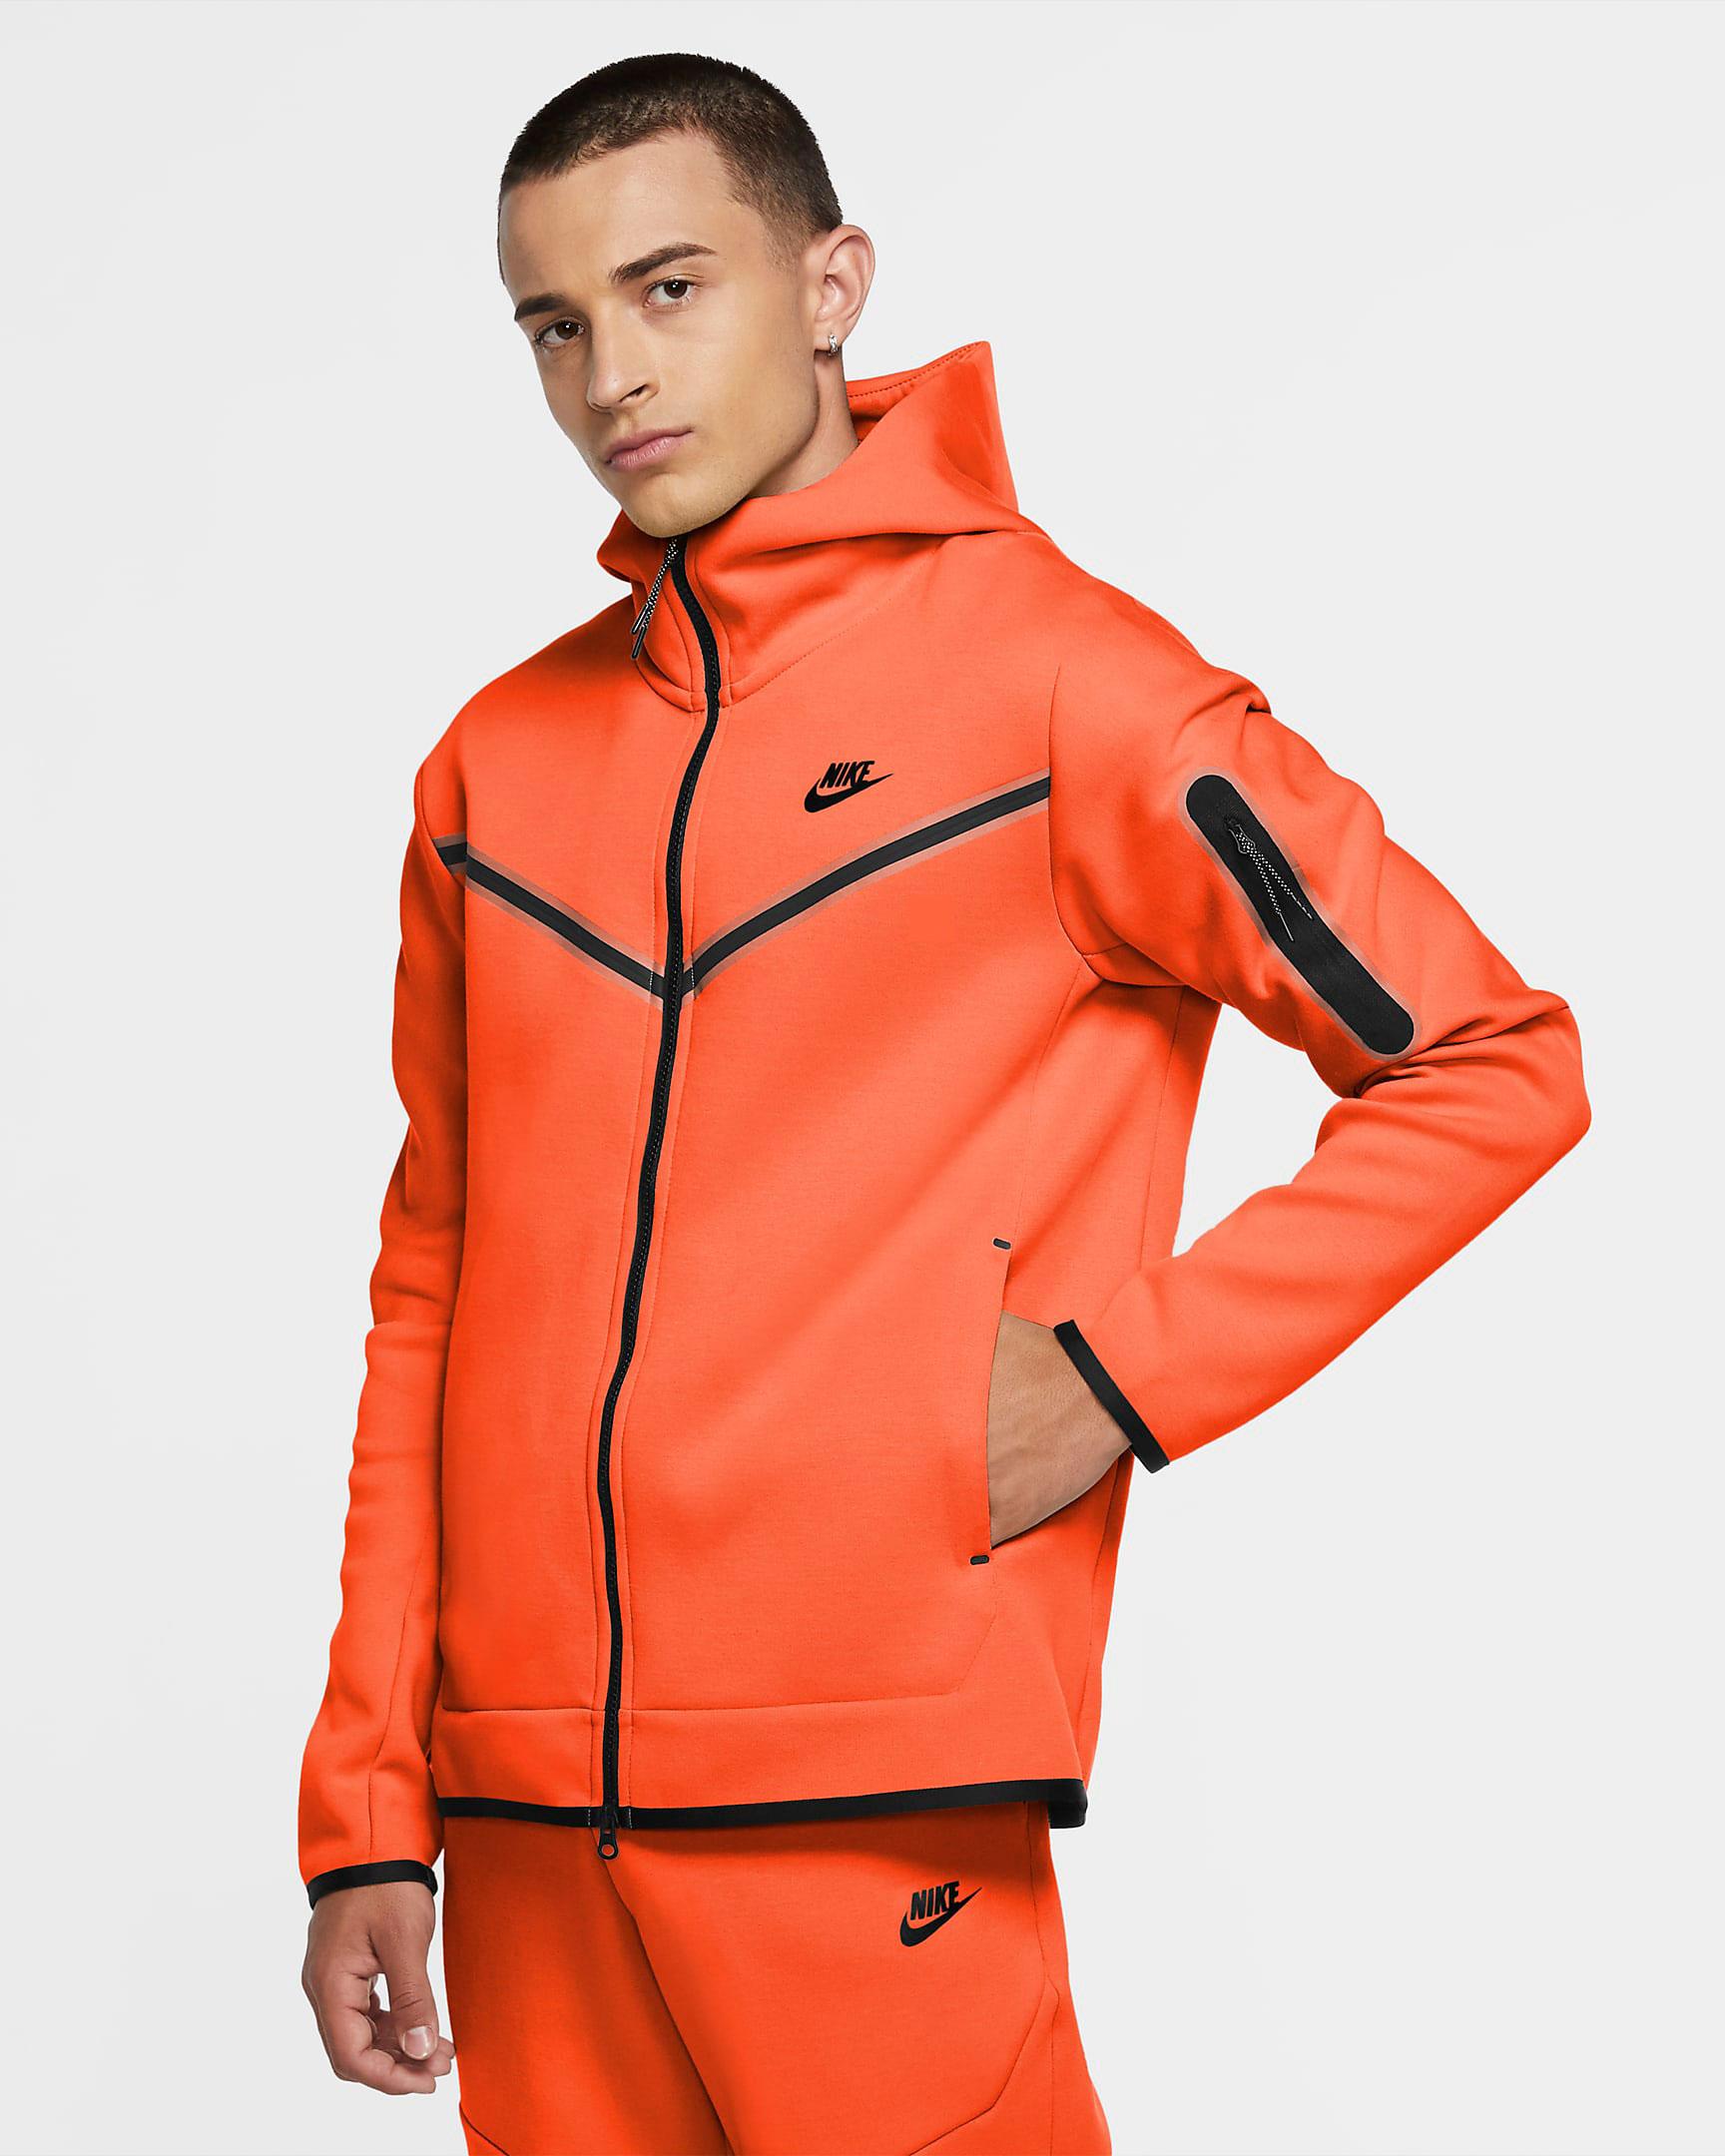 nike-tech-fleece-orange-hoodie